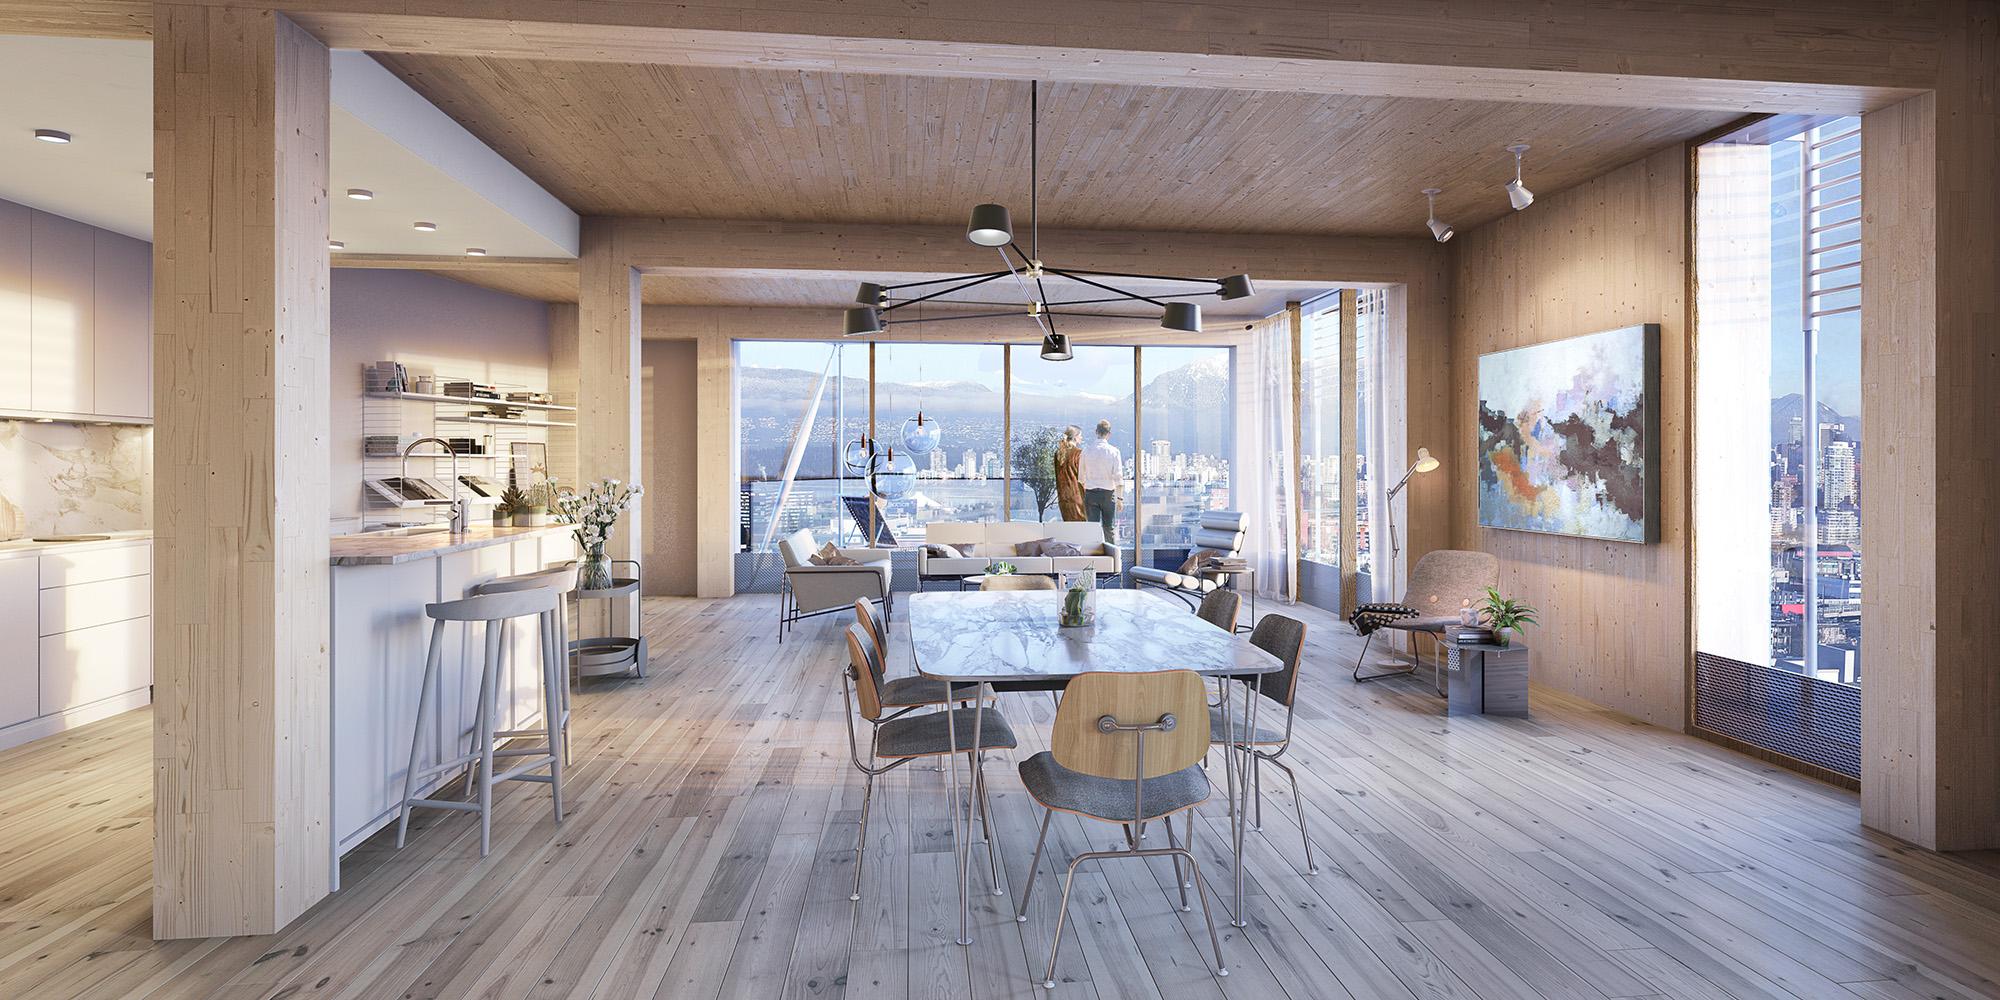 pw_8p_view04_interior_apartment_vismo.dk.jpg